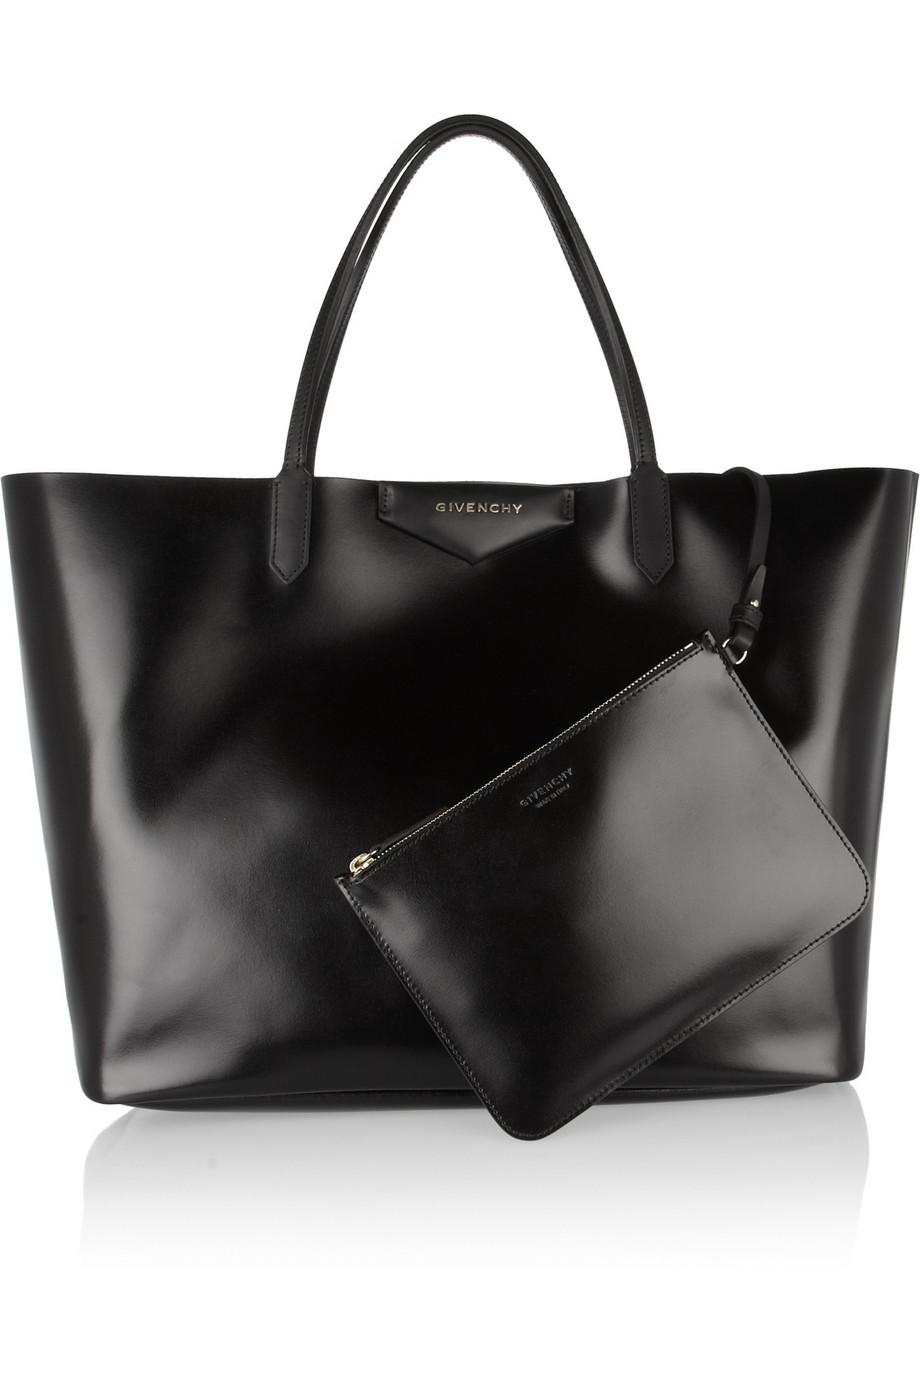 1b139291799a Givenchy Large Antigona Shopping Bag in Shiny Black Leather in Black ...